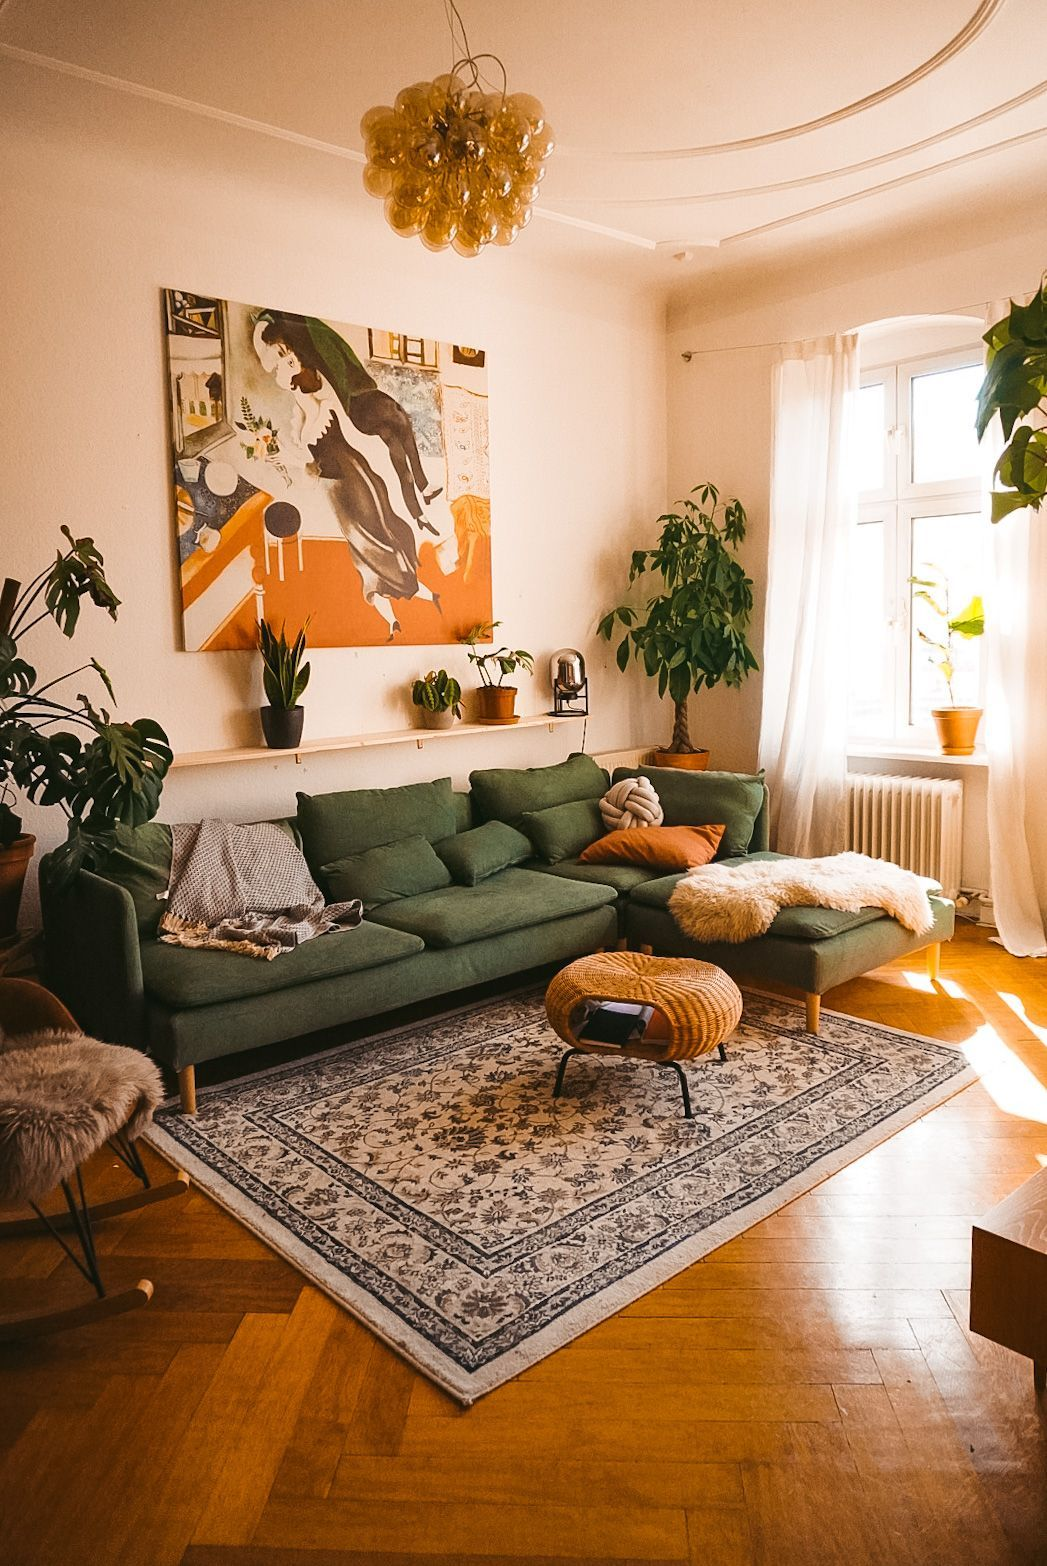 60 Vintage Living Room Ideas Decoration Home Home Decor Home Decor Bedroom